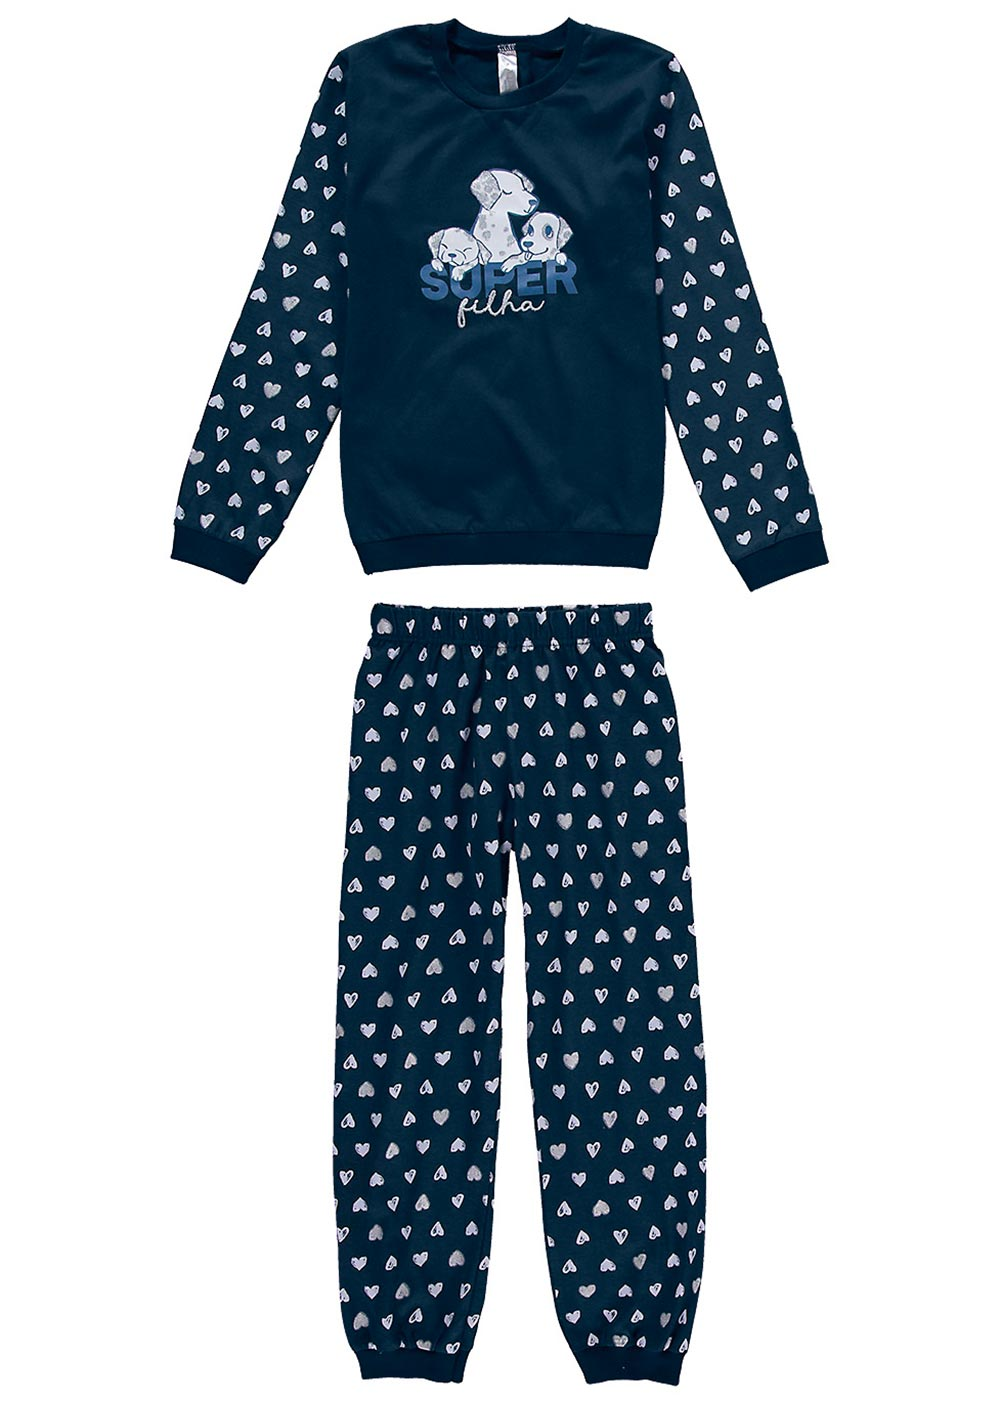 Pijama Infantil Feminino Inverno Mãe e Filha Malwee